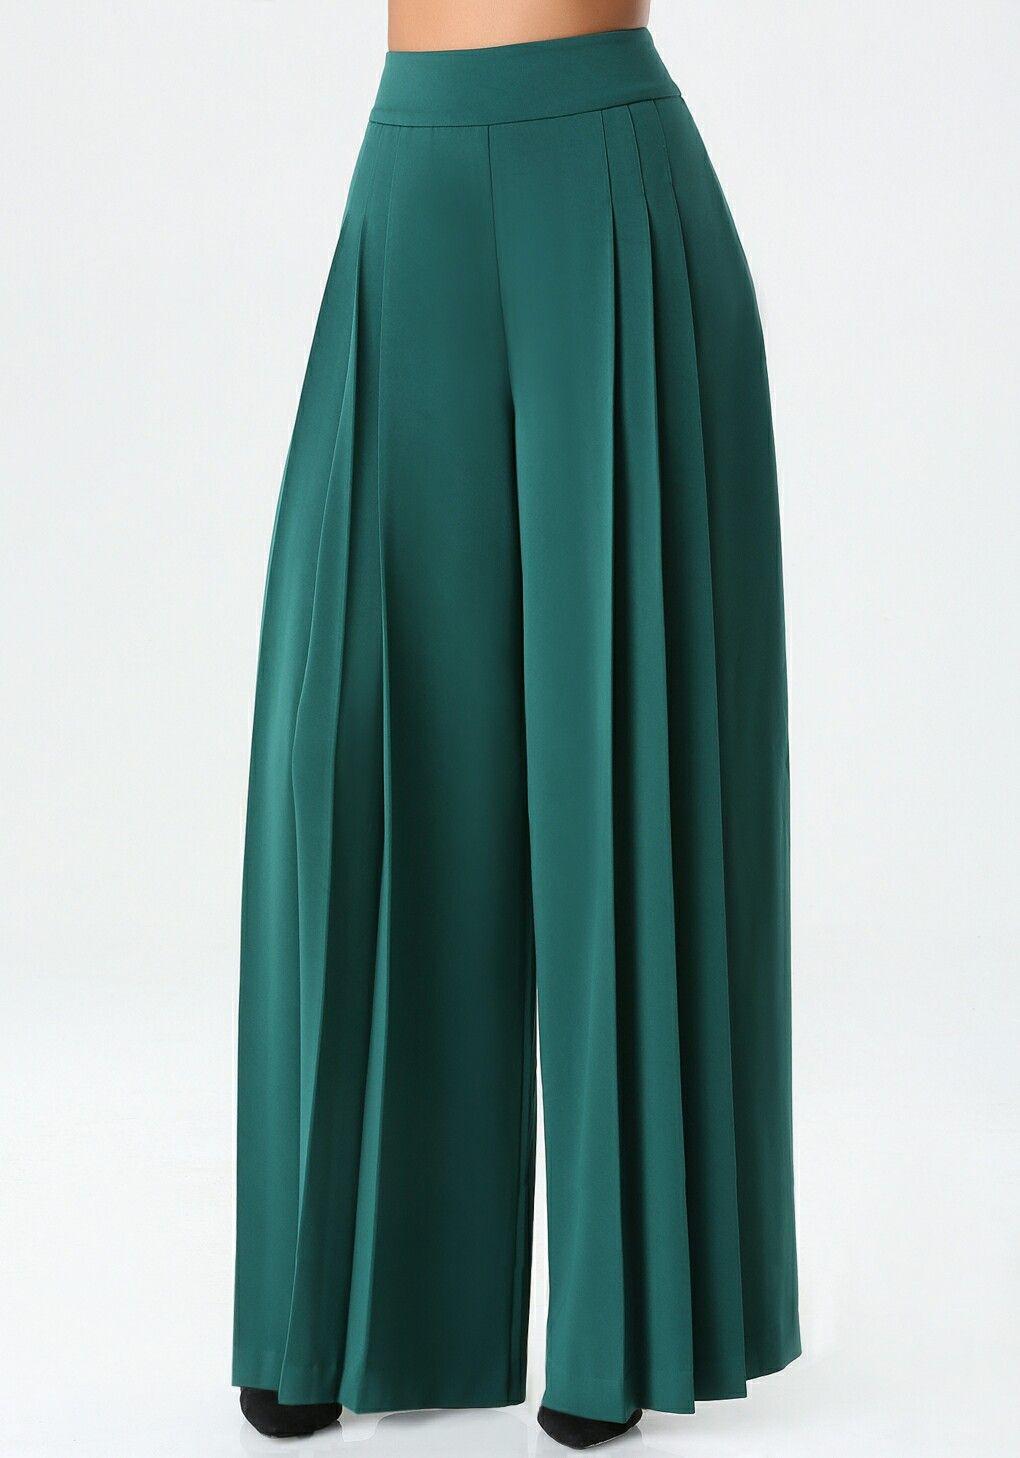 002a1abfc1a96 Modelos Falda Pantalon Larga